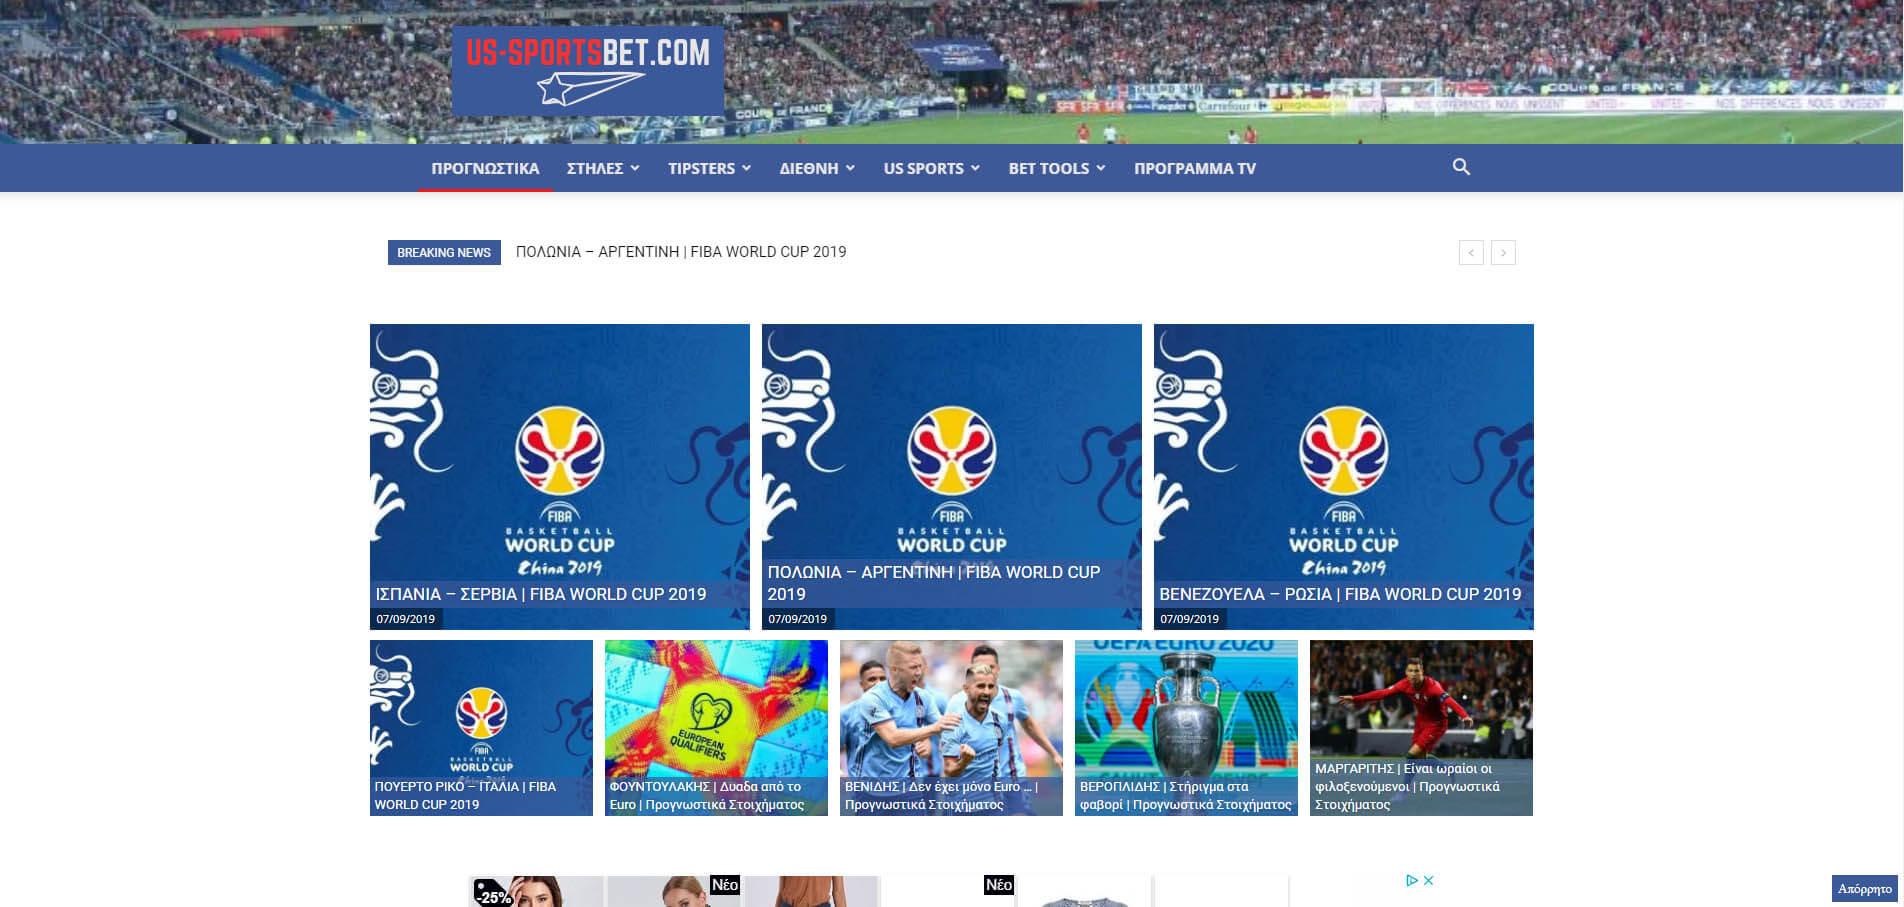 Us-sportsbet.com GDPR & Speed Optimisation